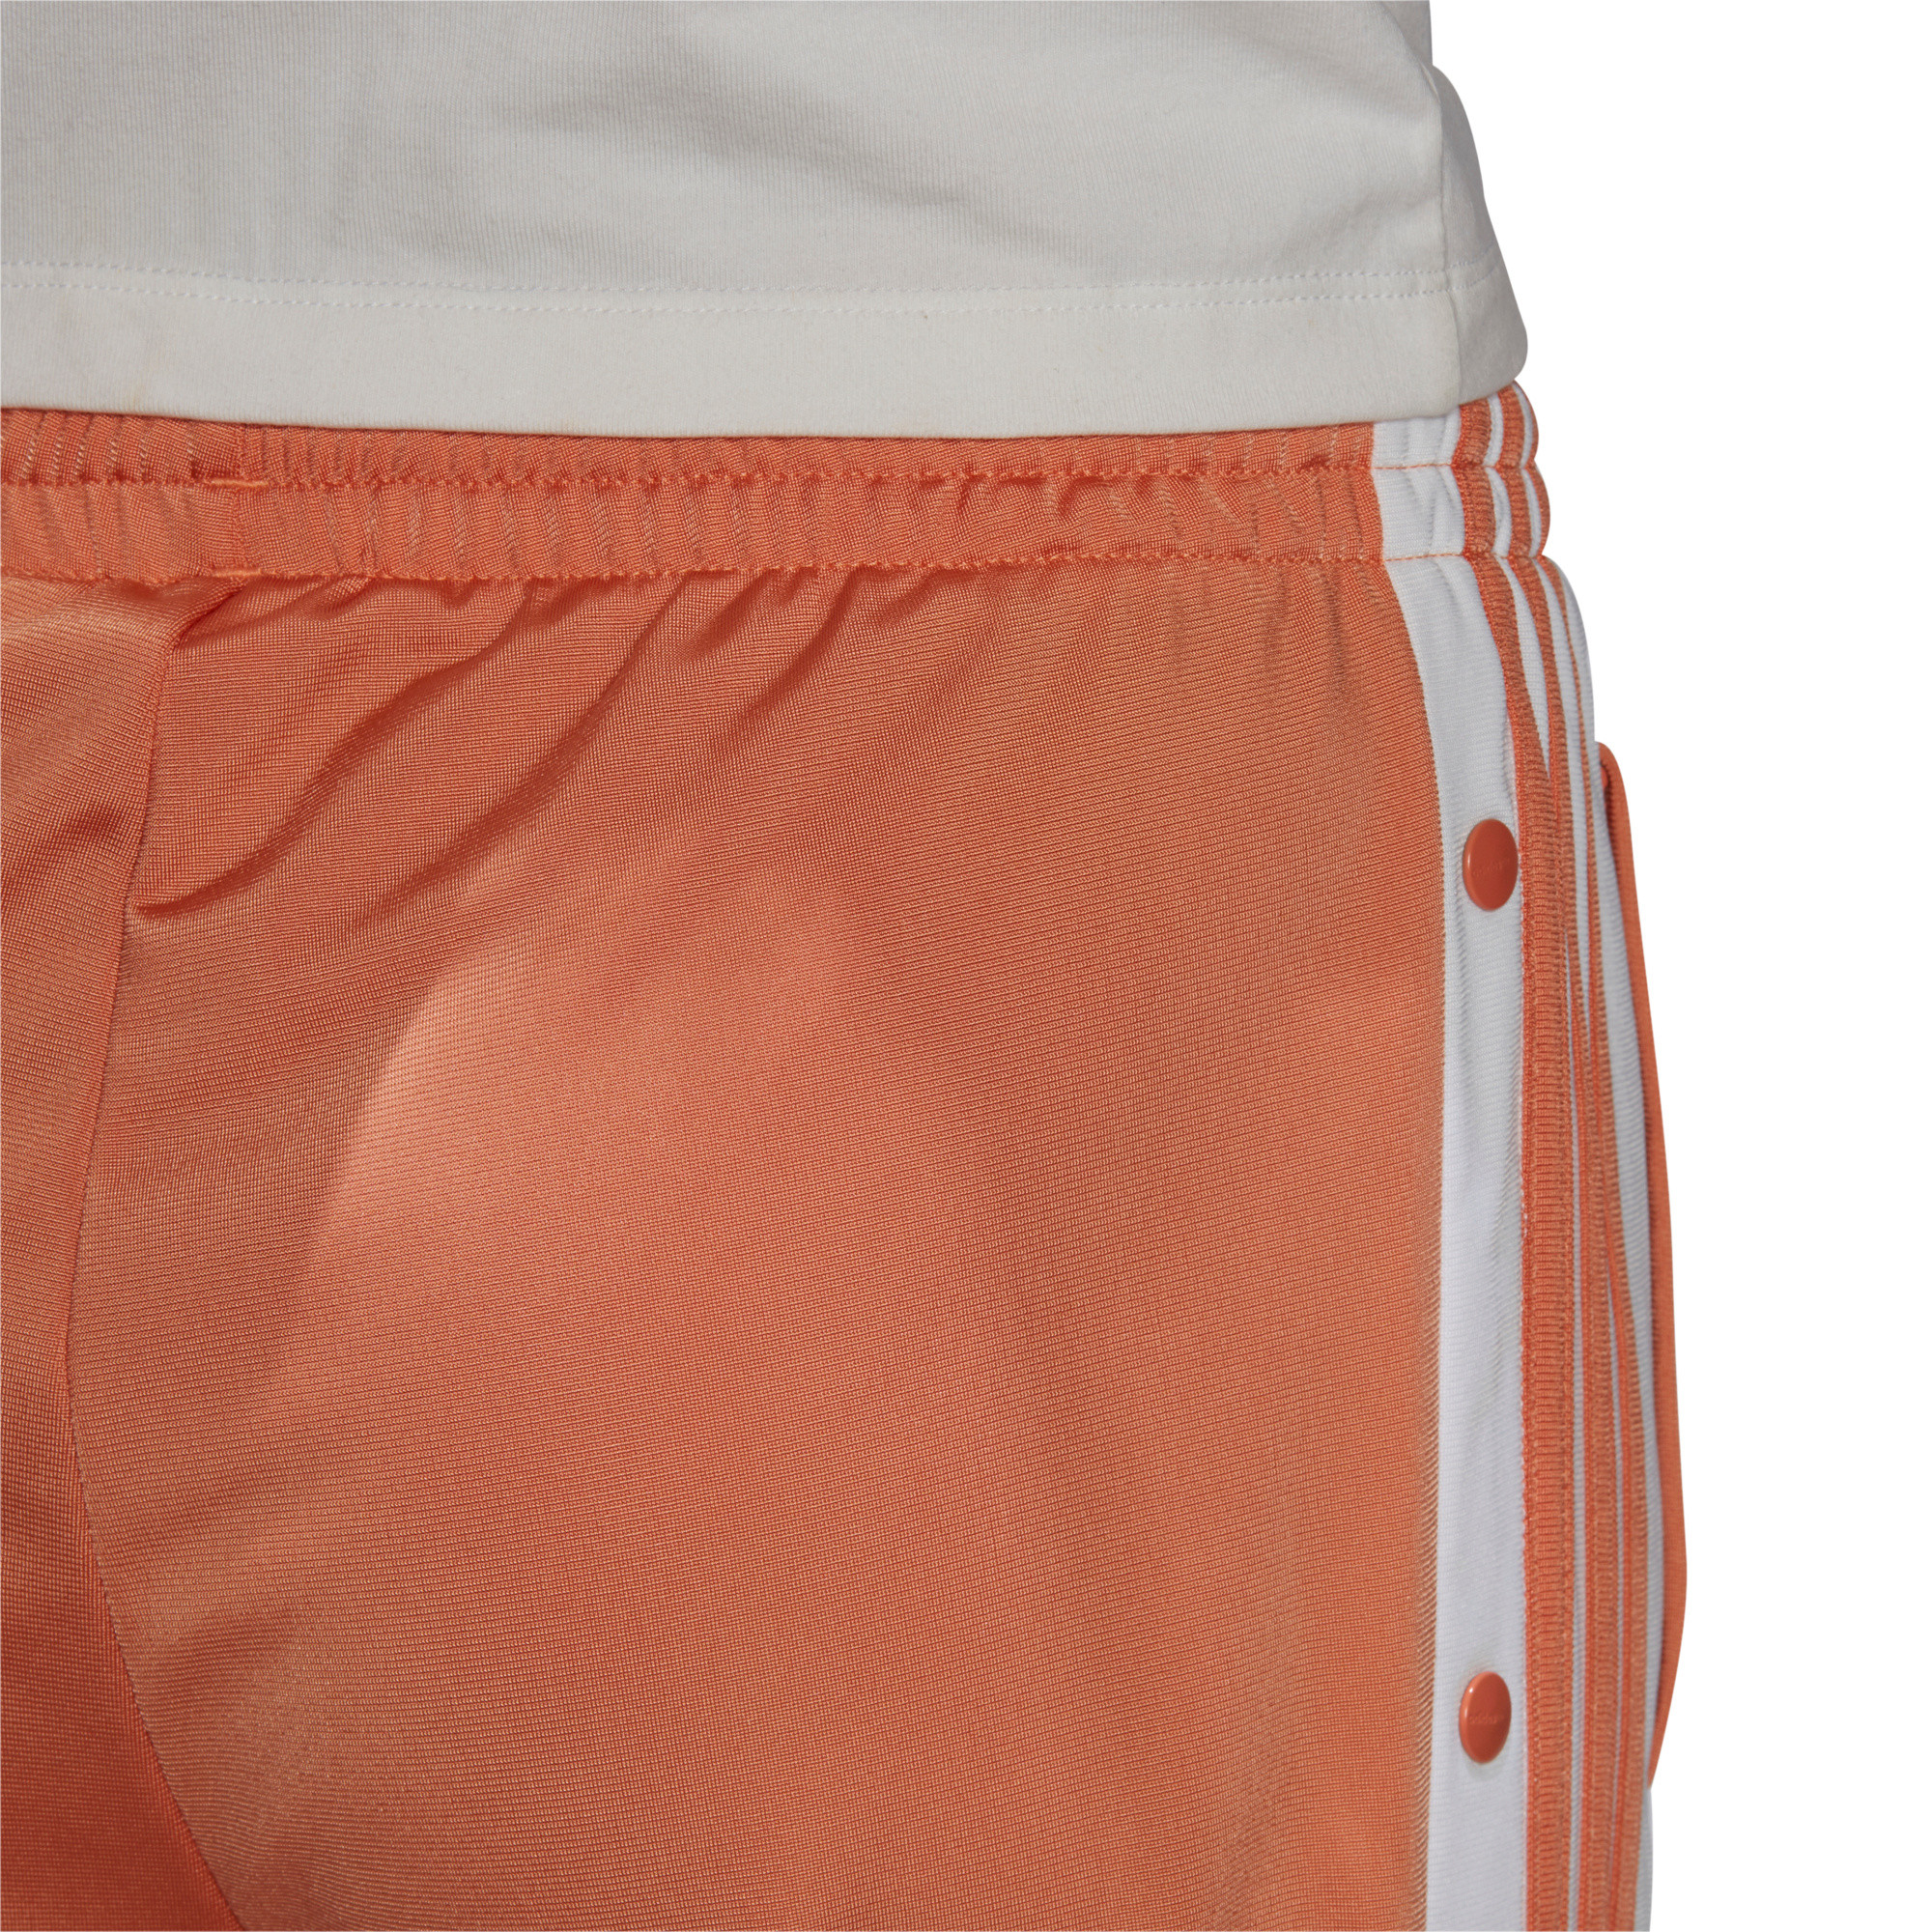 Pantaloni tuta adicolor Classics adibreak, Marrone bronzo, large image number 7